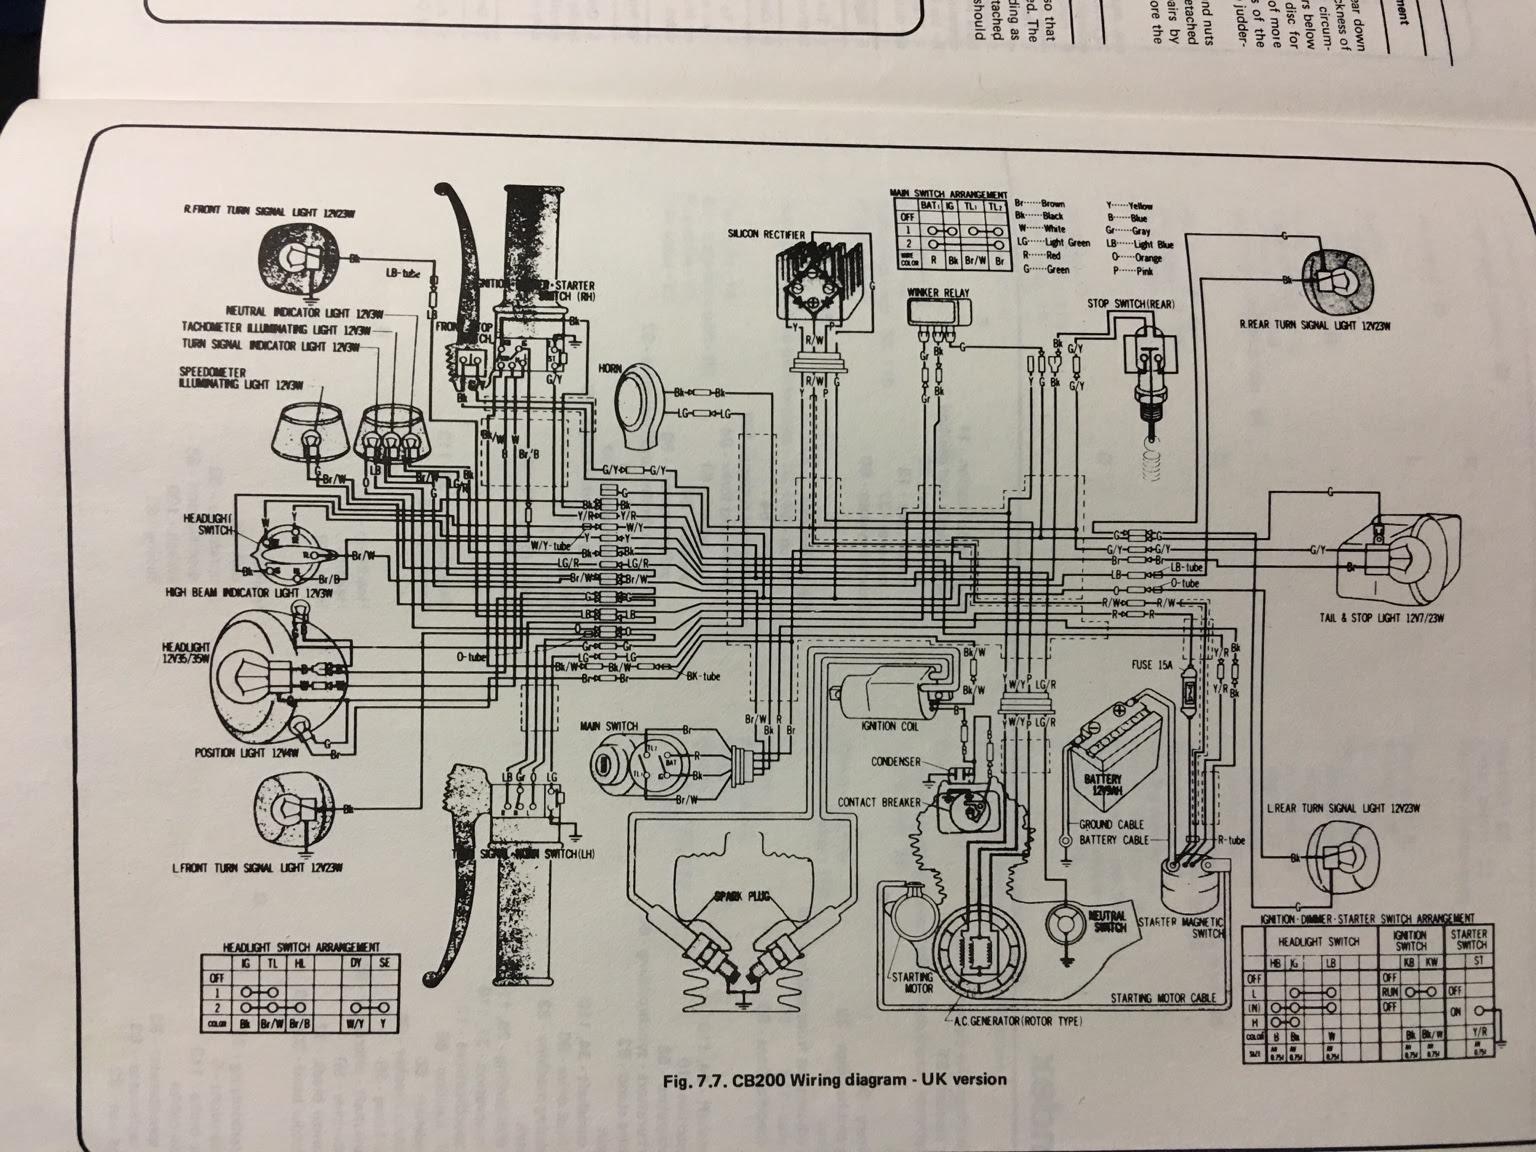 Honda Cb175 Wiring Diagram Wiring Diagram Information Information Musikami It